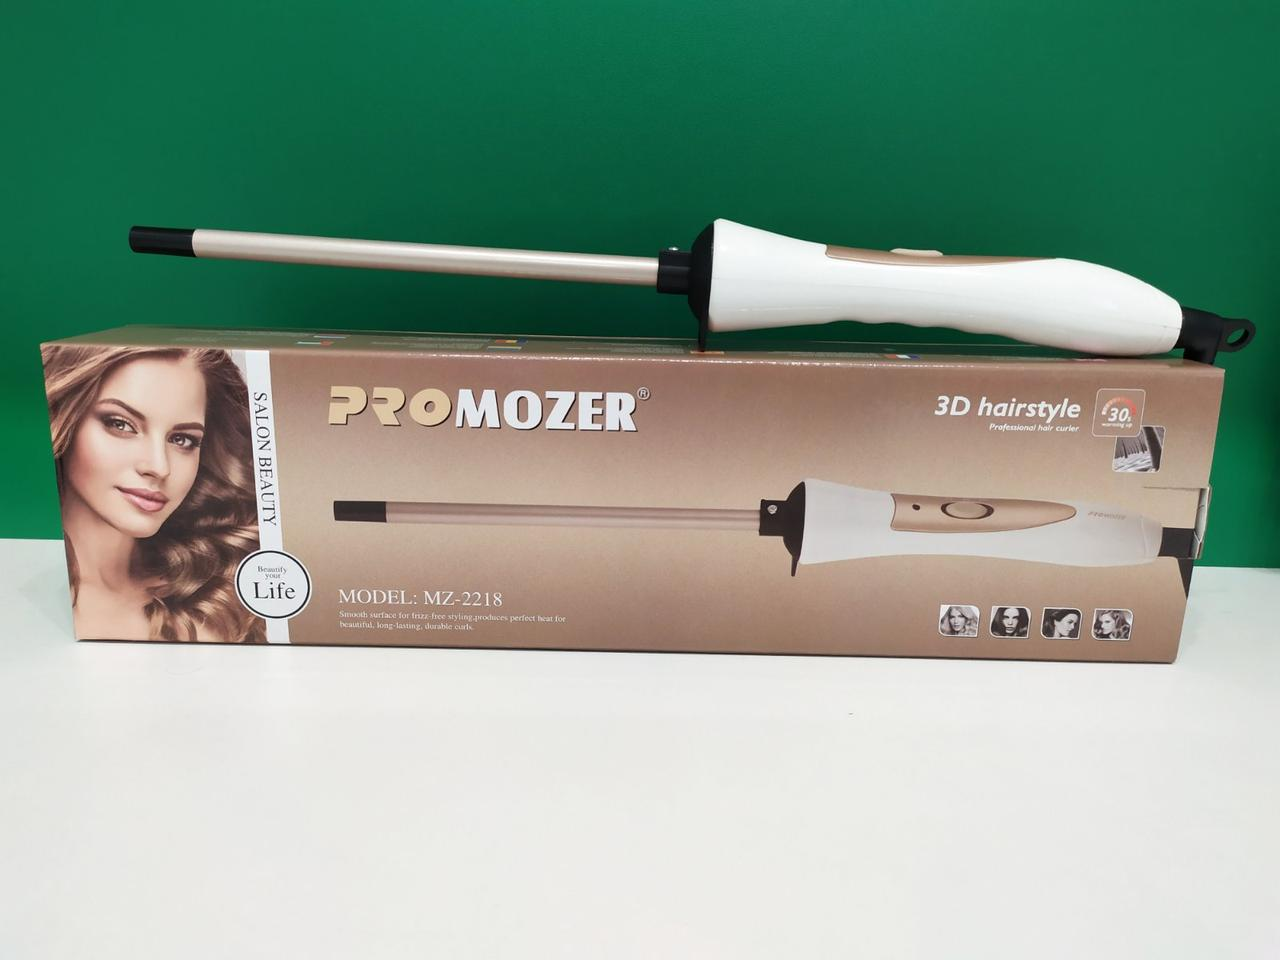 Плойка для волос афрокудри Pro Mozer MZ-2218 9 мм афро плойка для завивки волос Mozer 2218 локон афроплойка